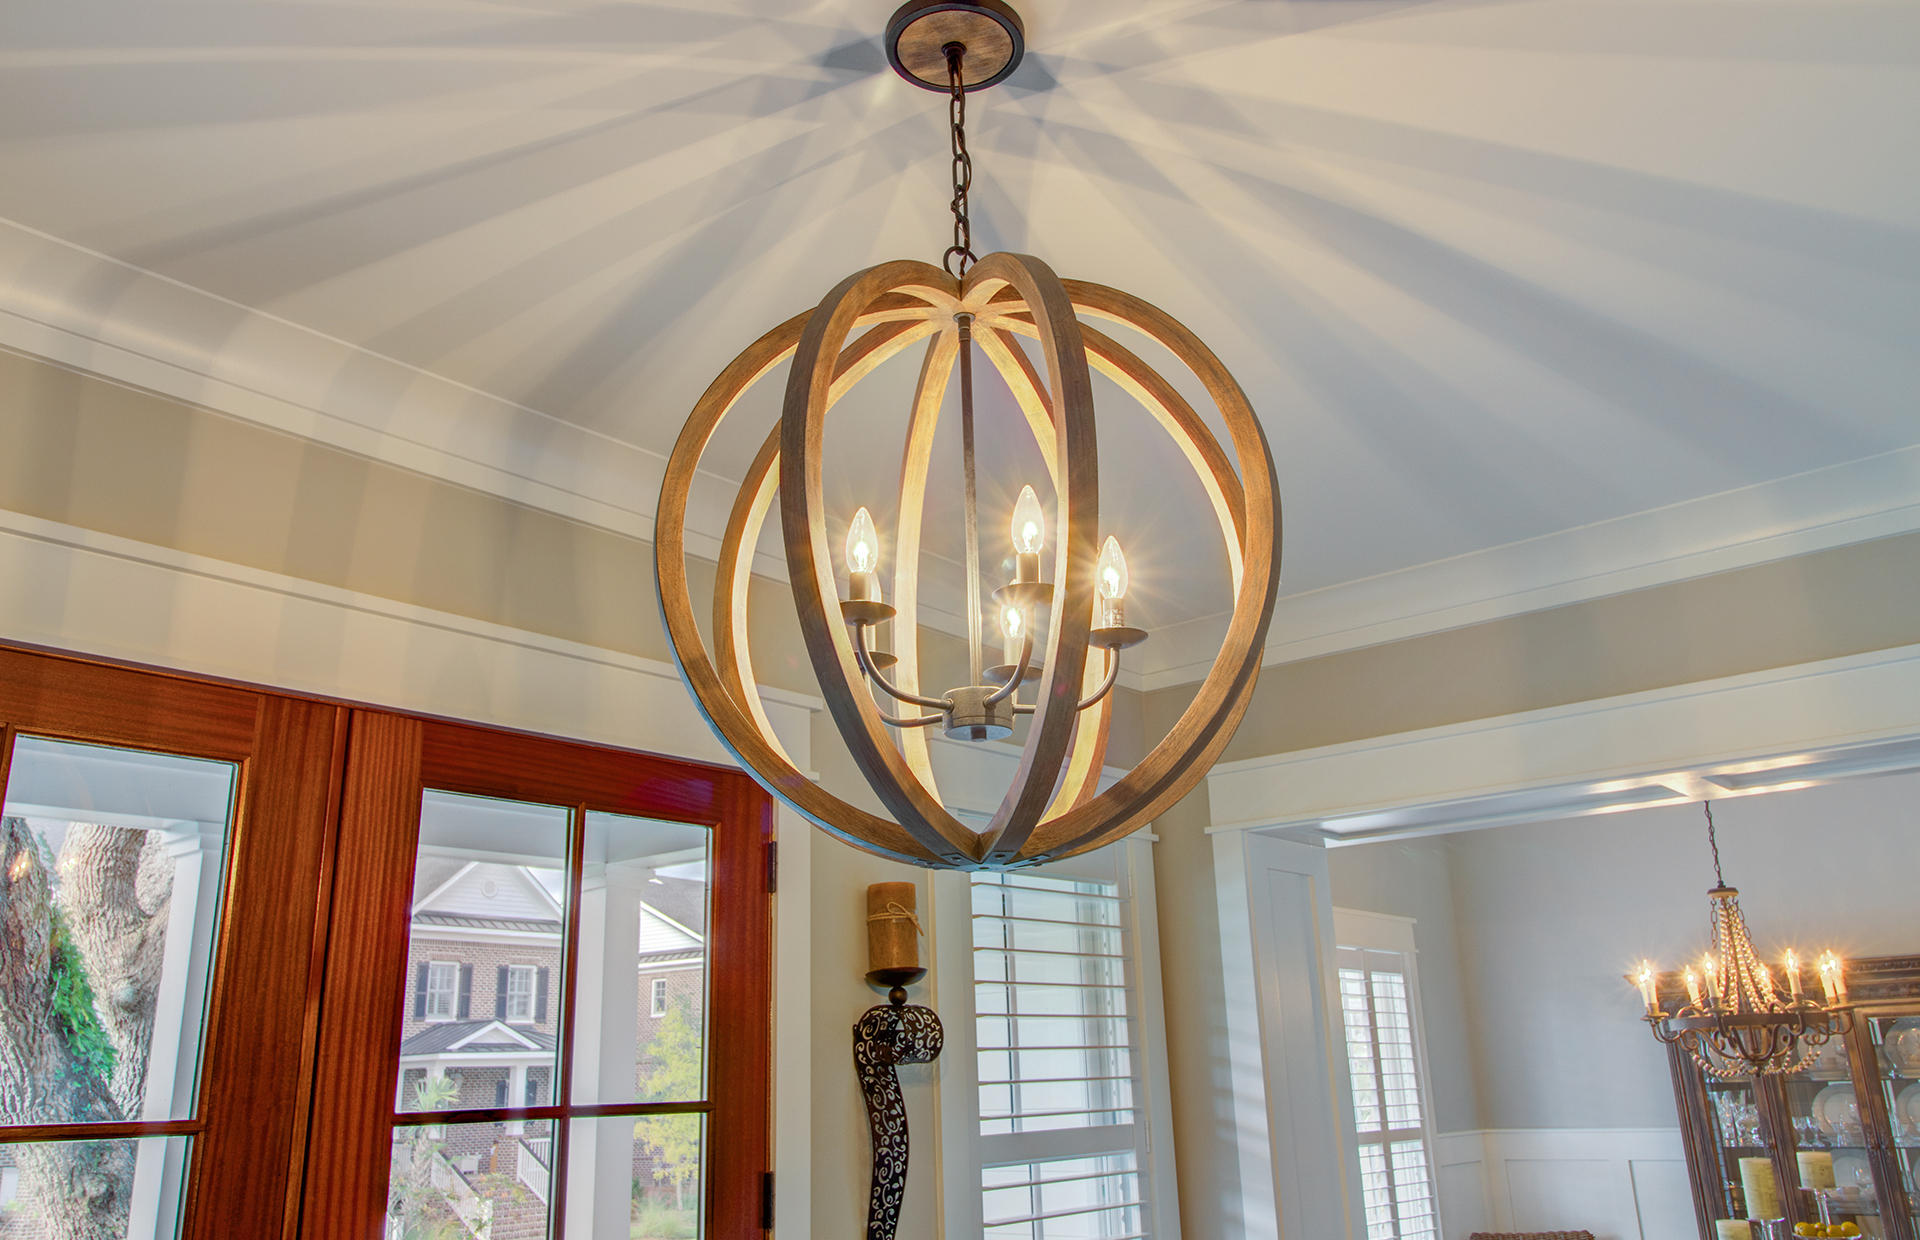 Daniel Island Park Homes For Sale - 117 Brailsford, Charleston, SC - 16